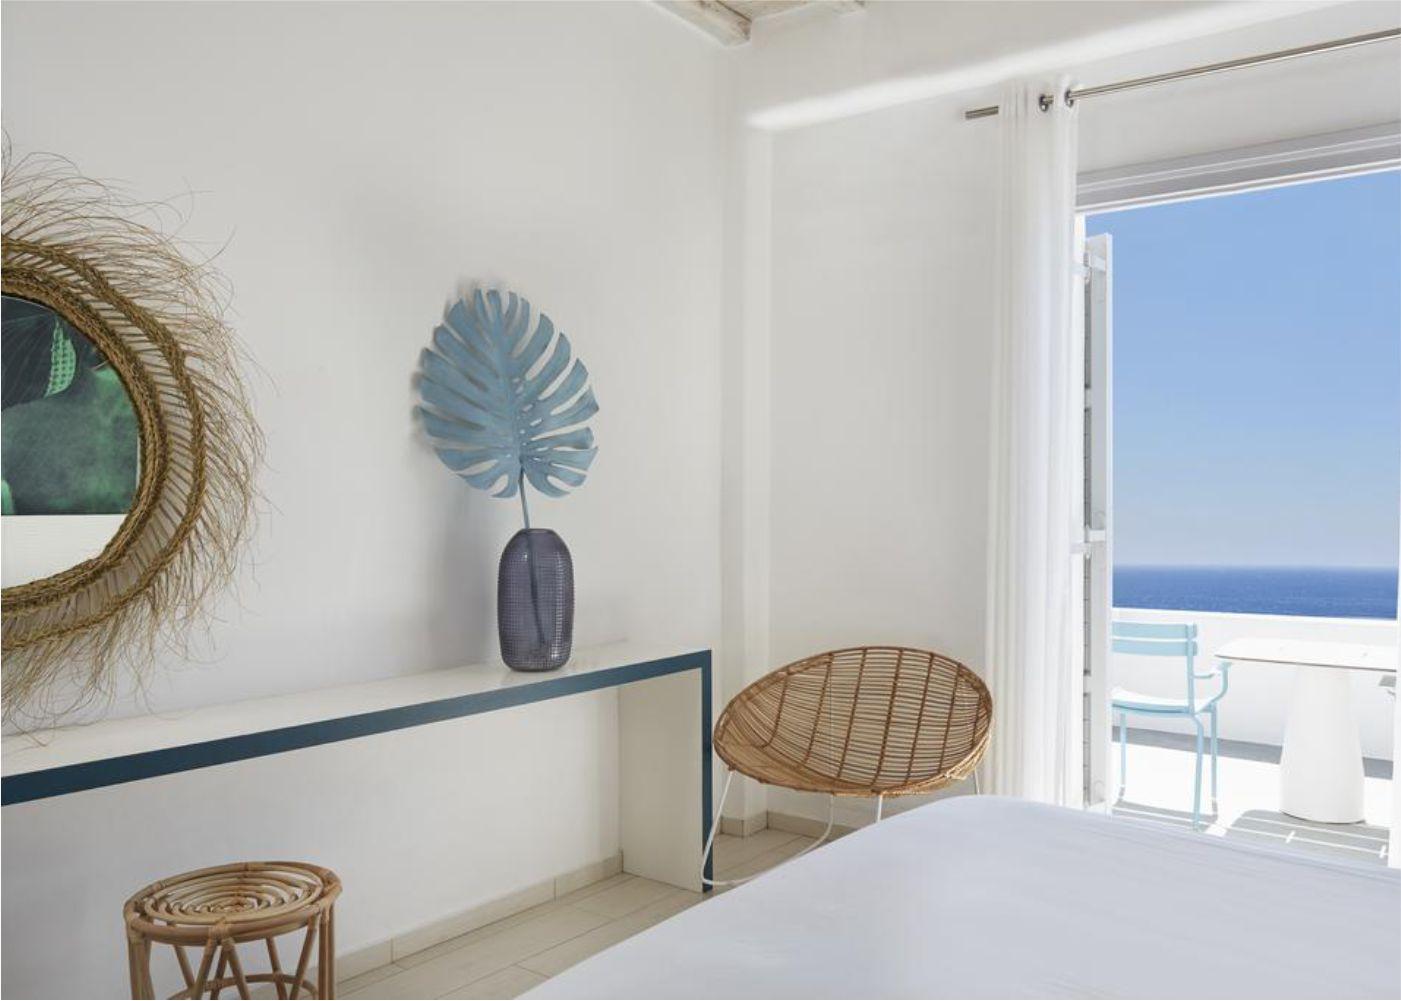 paraskevi-interior-kouros-hotel-2